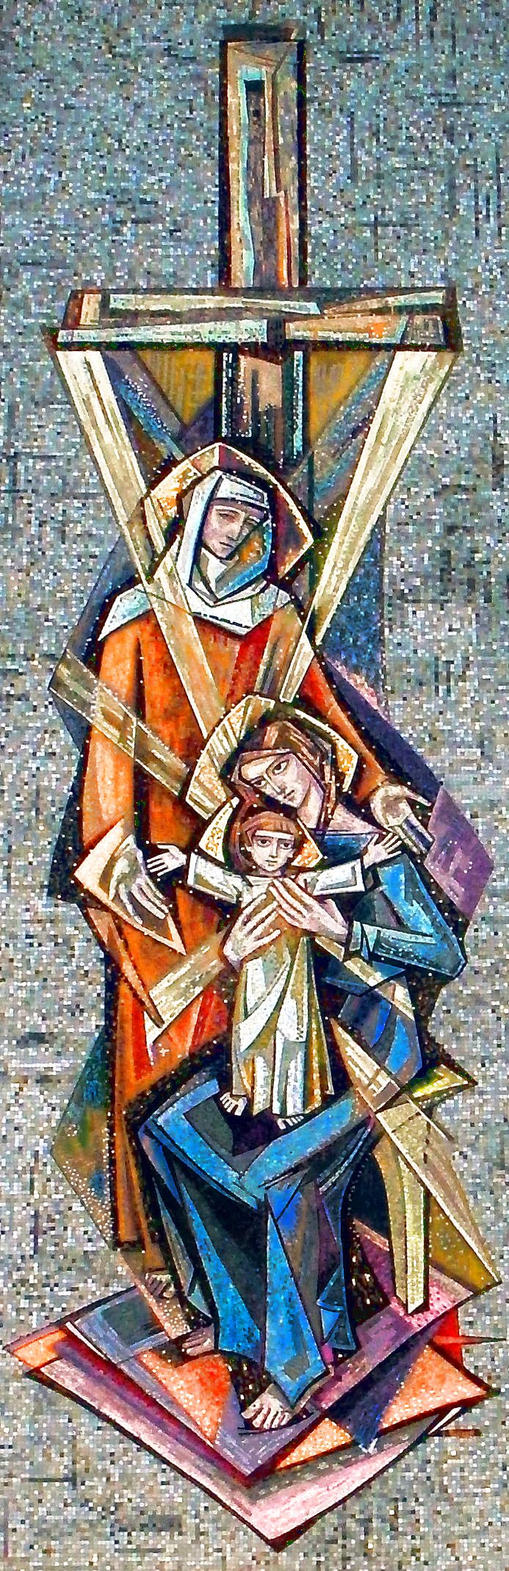 Saint Anne's Mosaic (central) by krasblak